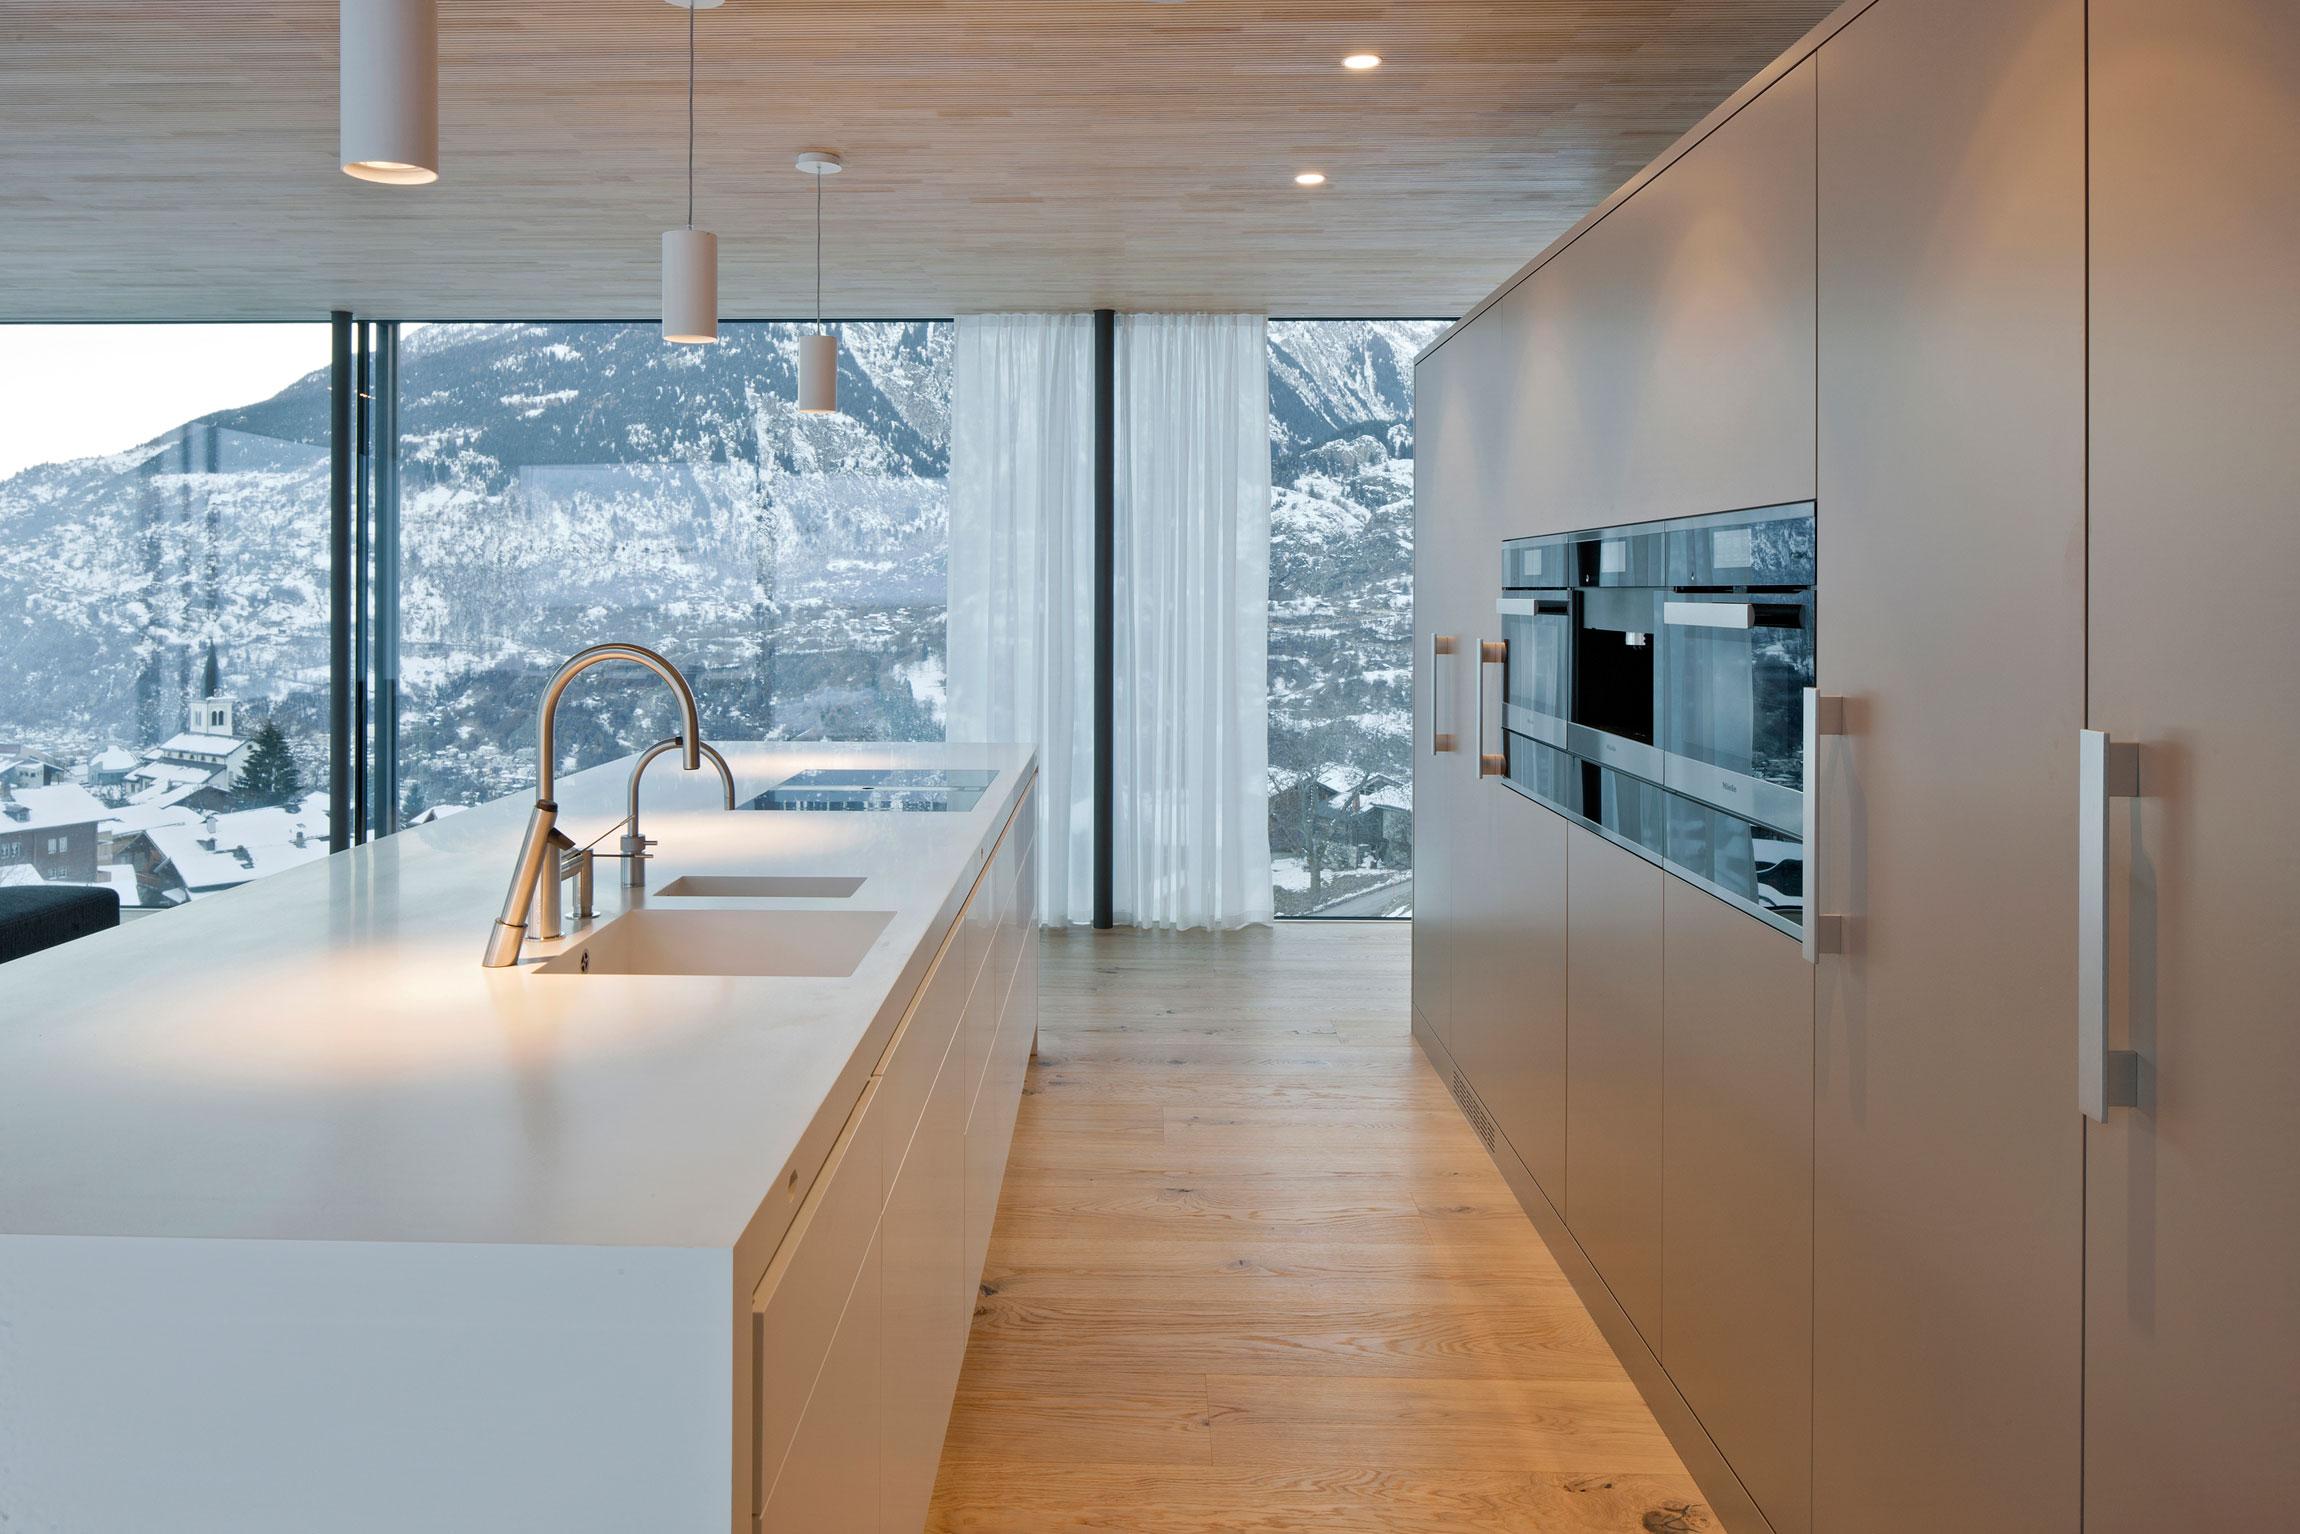 minergie house with hi macs kitchen in termen by zeiter berchtold caandesign architecture. Black Bedroom Furniture Sets. Home Design Ideas